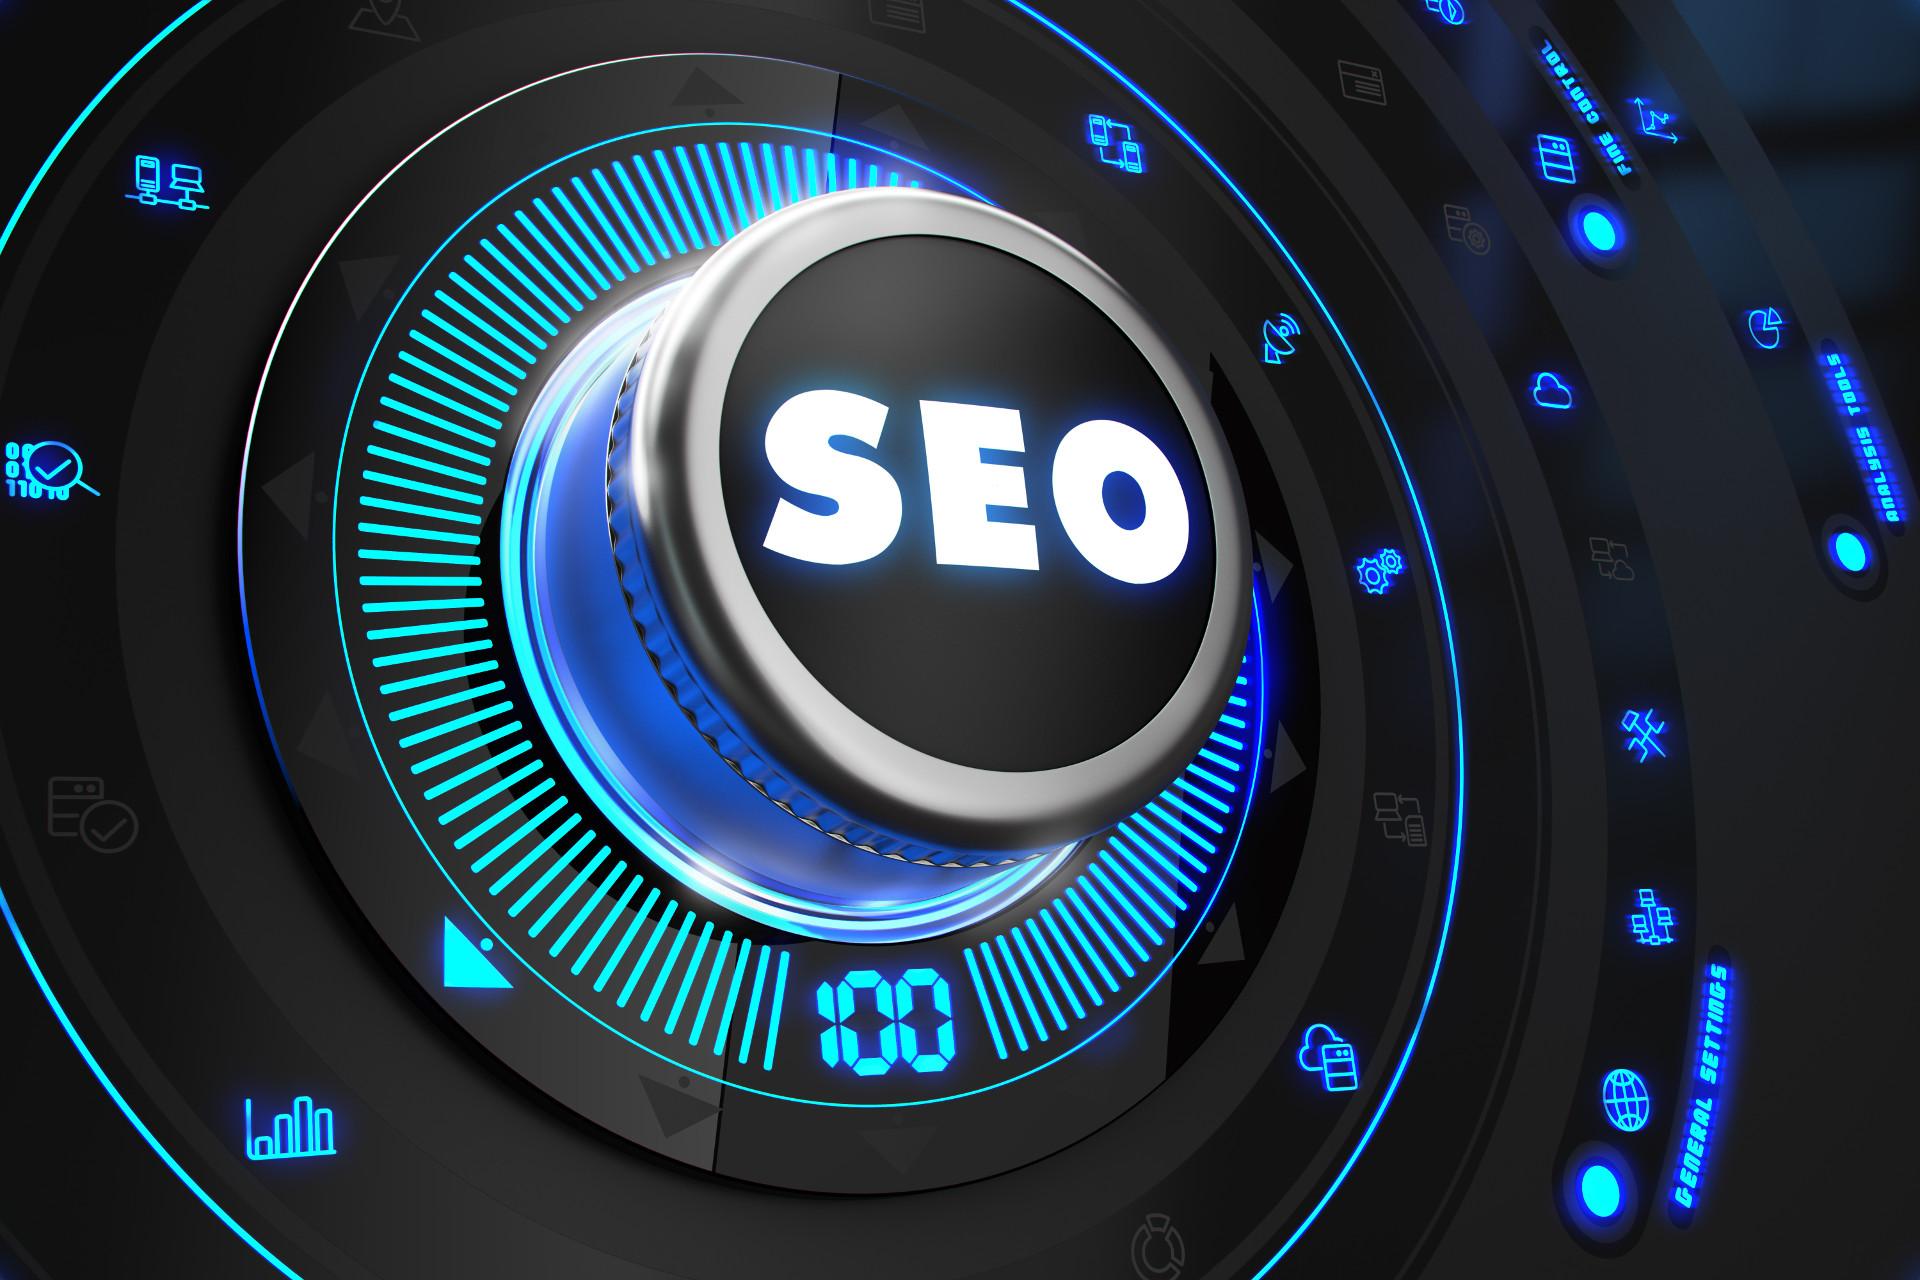 SEO dial website optimization